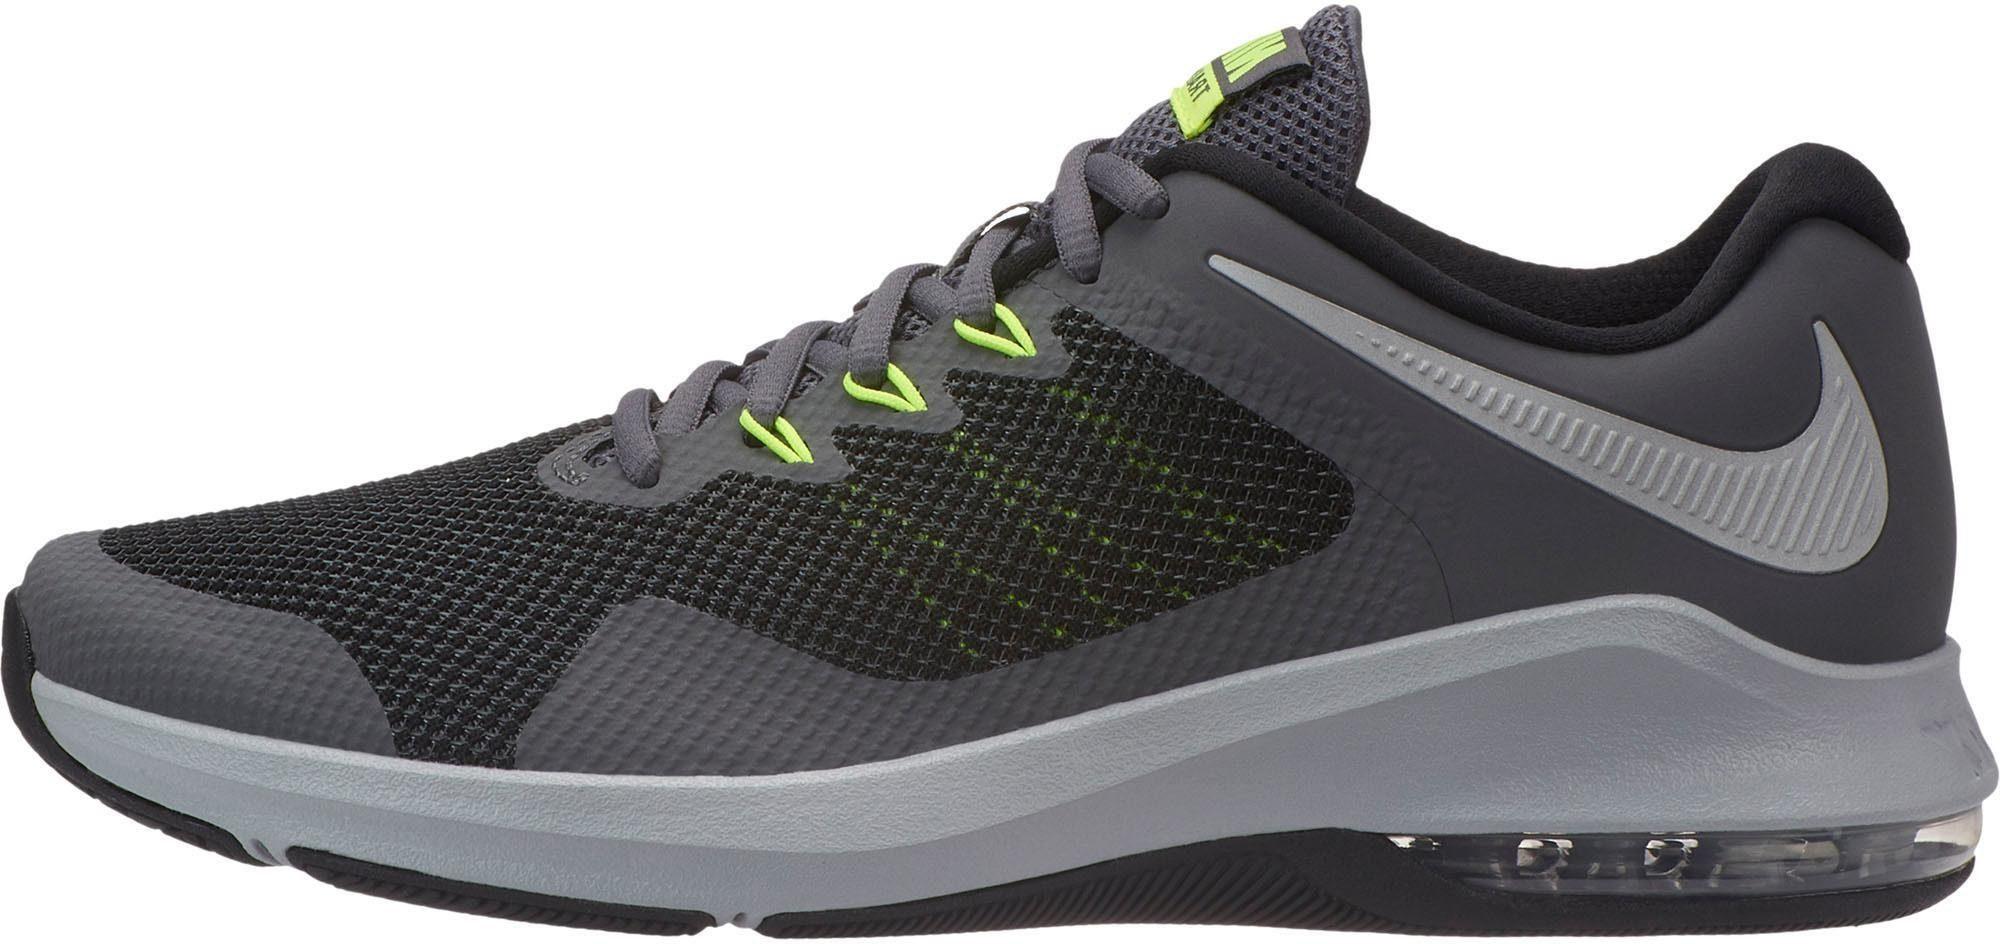 Nike »Air Max Alpha Trainer« Trainingsschuh kaufen | OTTO